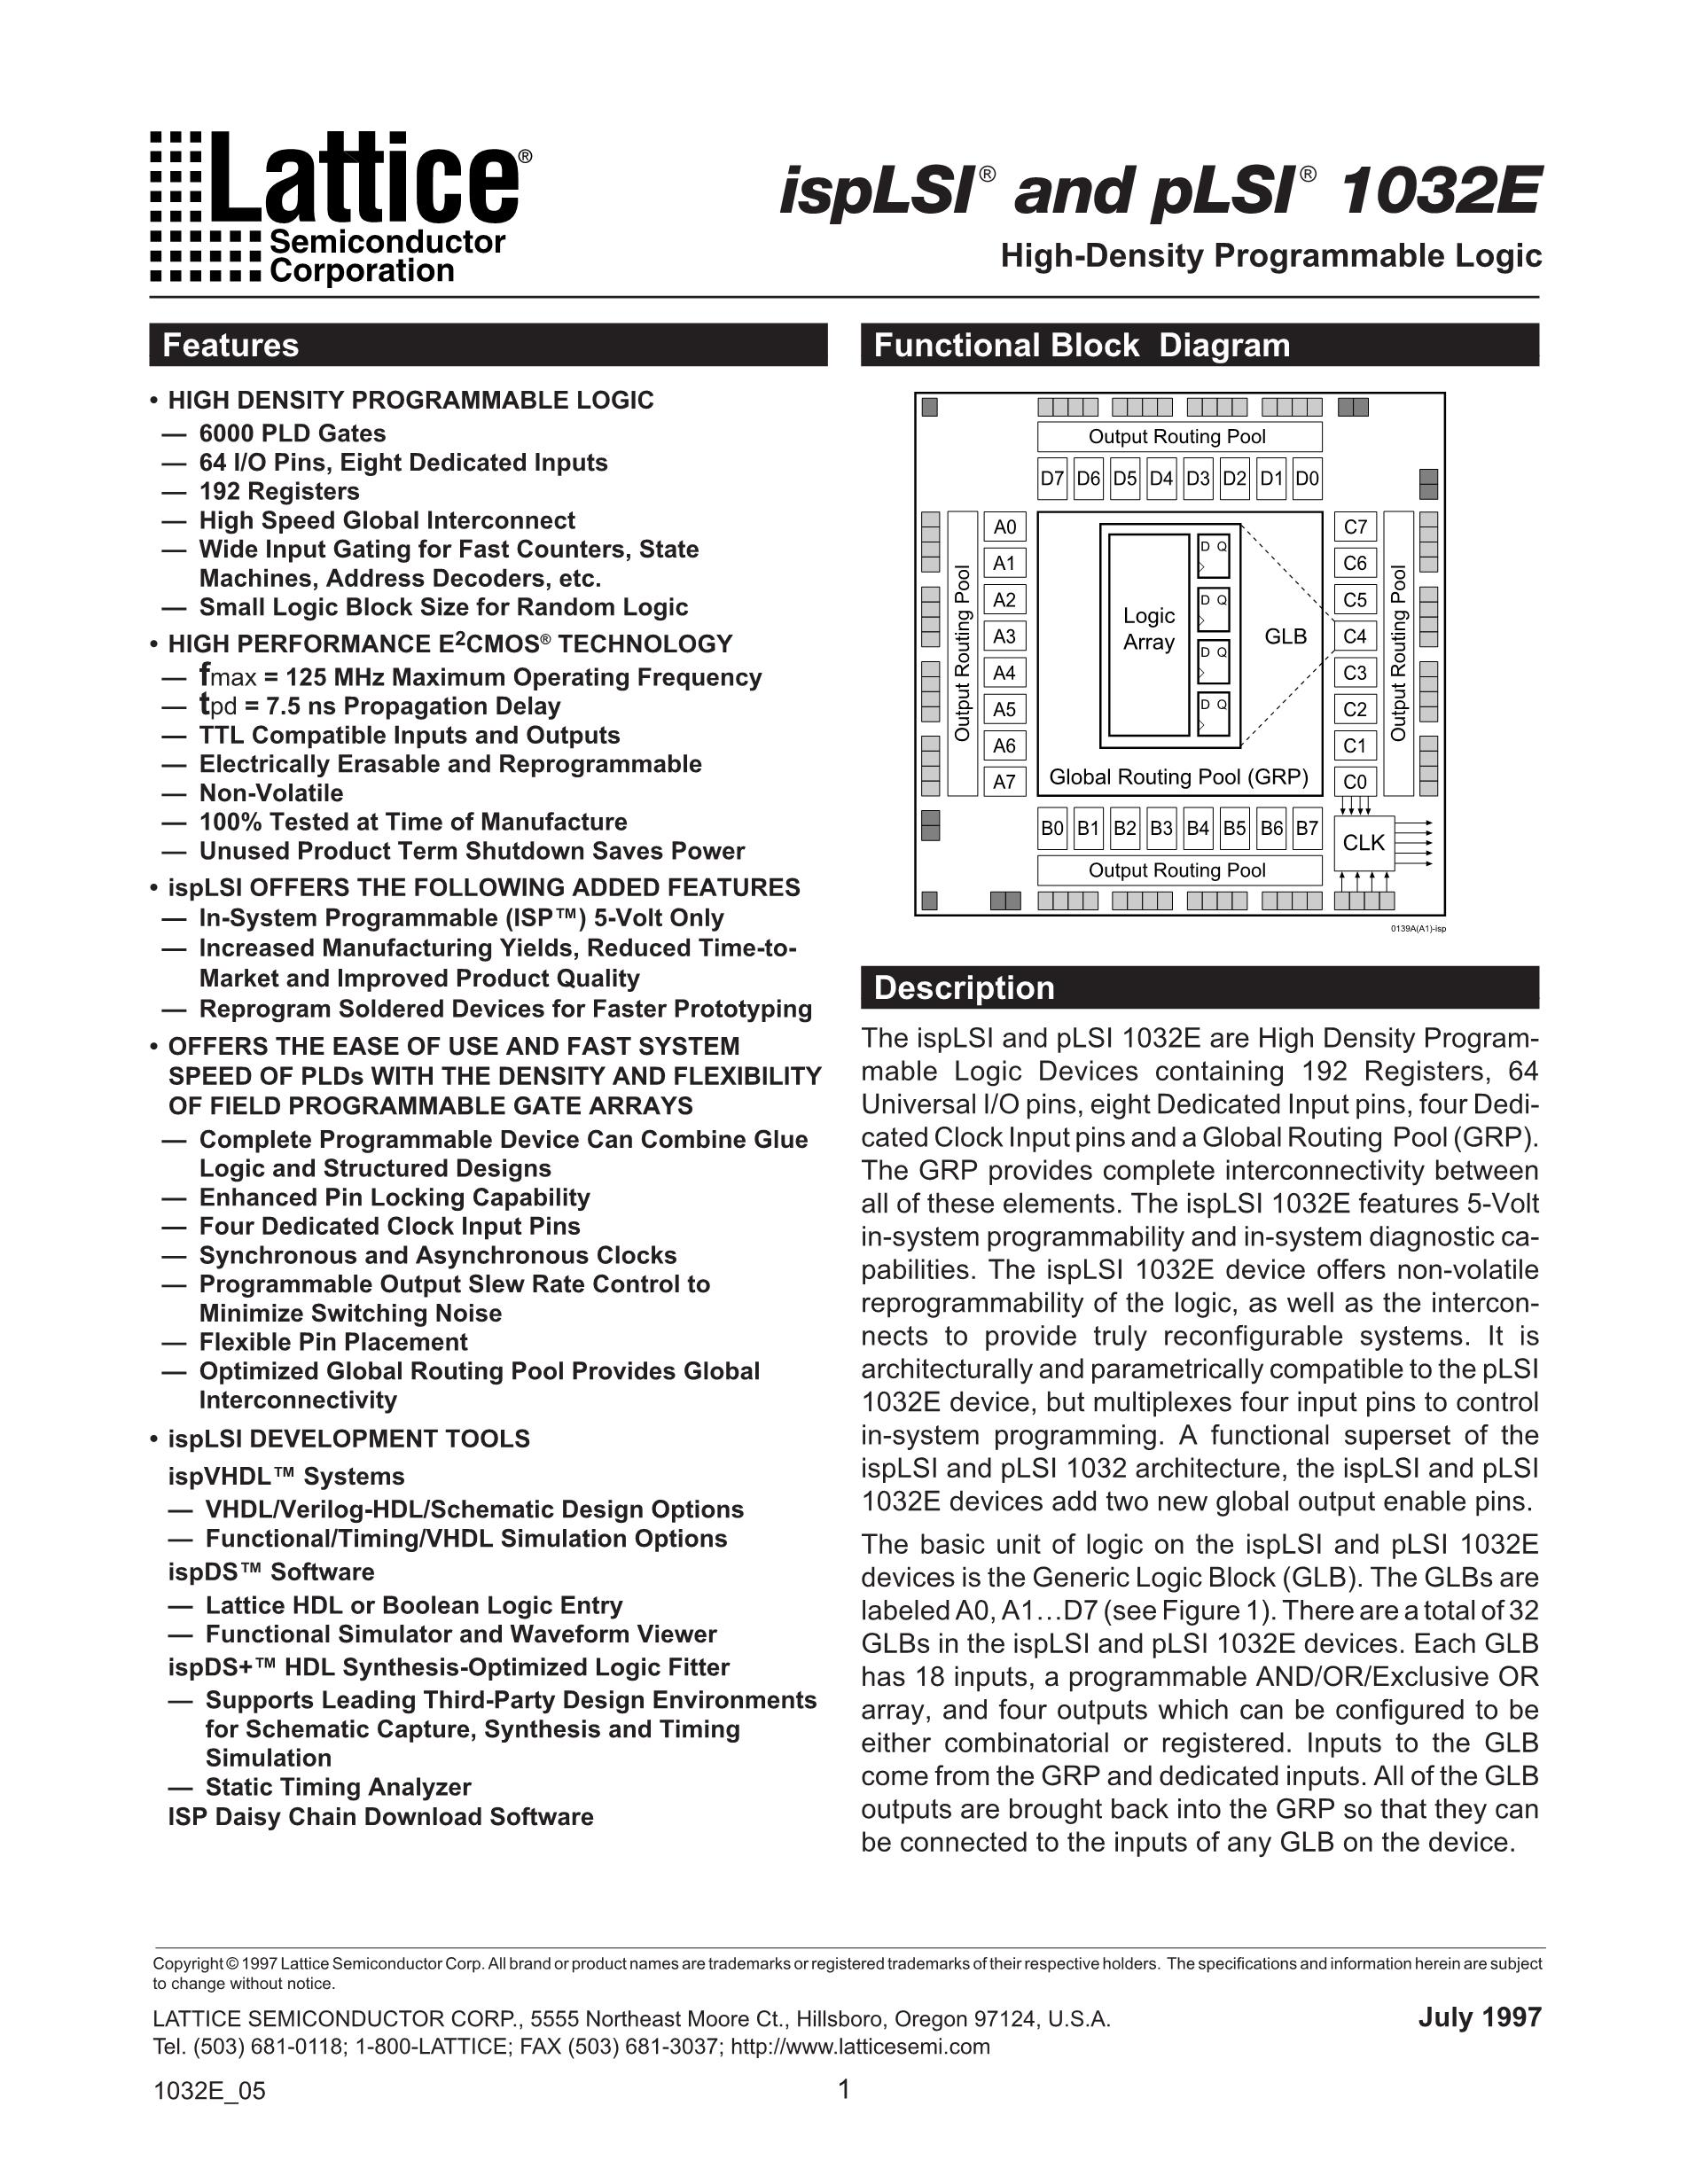 ISPLSI2064-80LTI's pdf picture 1